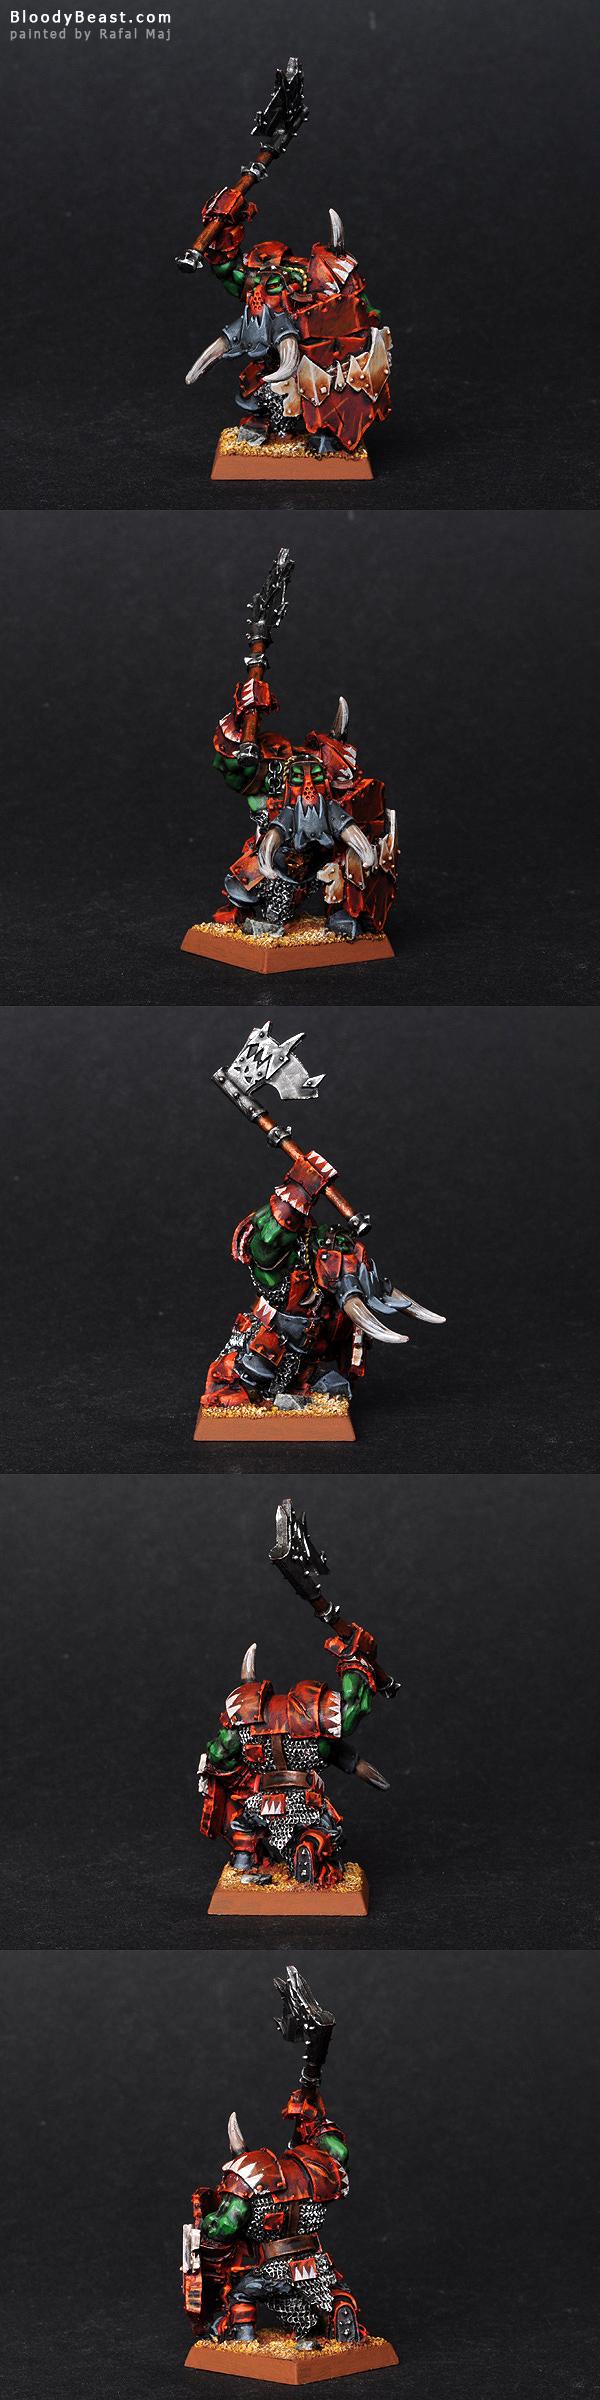 Black Orc Krimson Killer Big Boss painted by Rafal Maj (BloodyBeast.com)